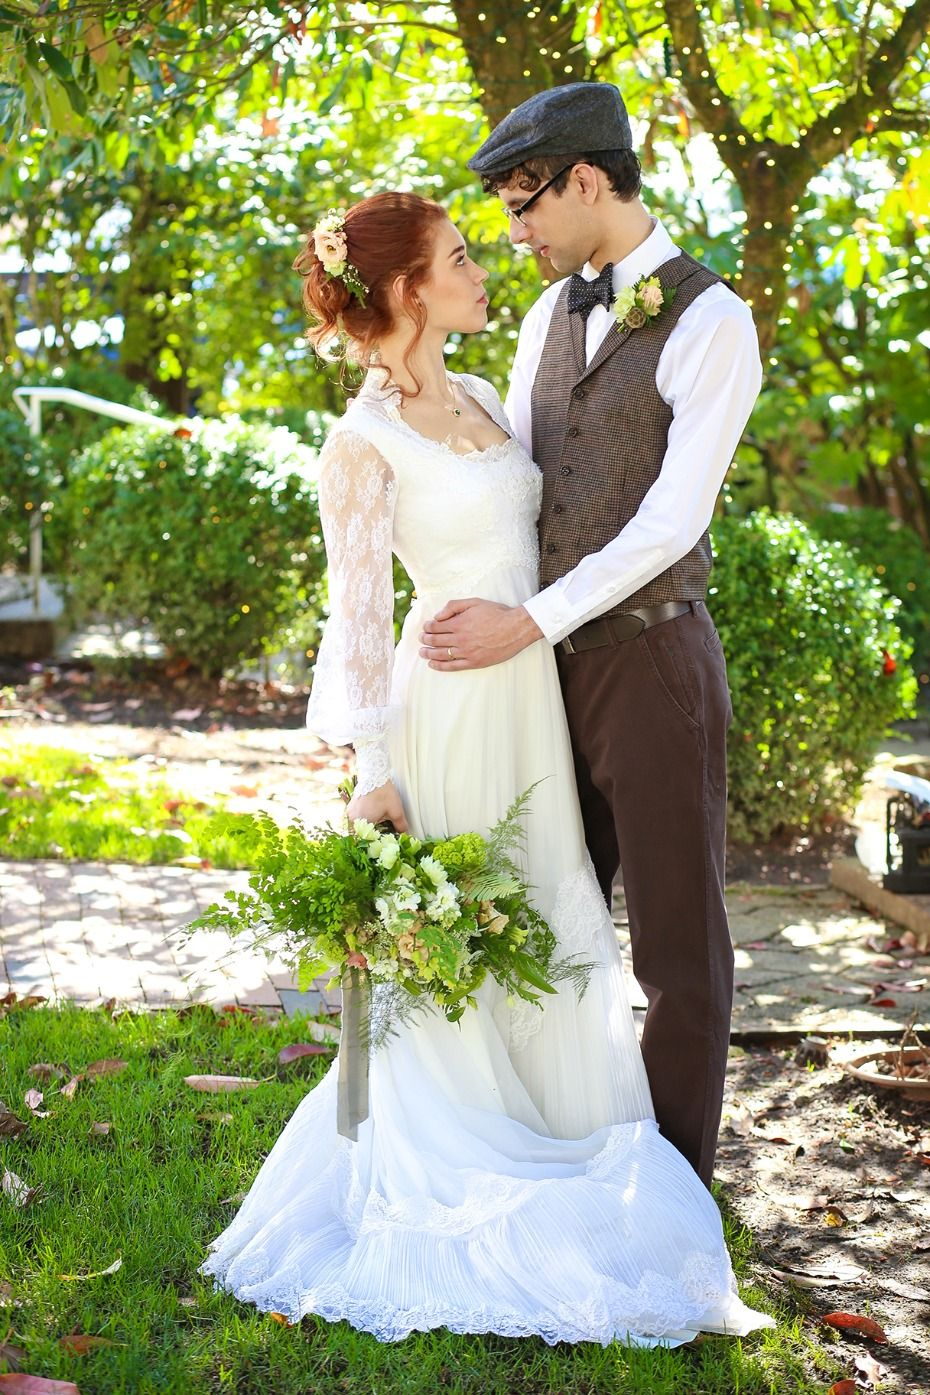 Anne of green gables wedding dress  Classic Vintage Wedding Ideas Inspired by Anne of Green Gables